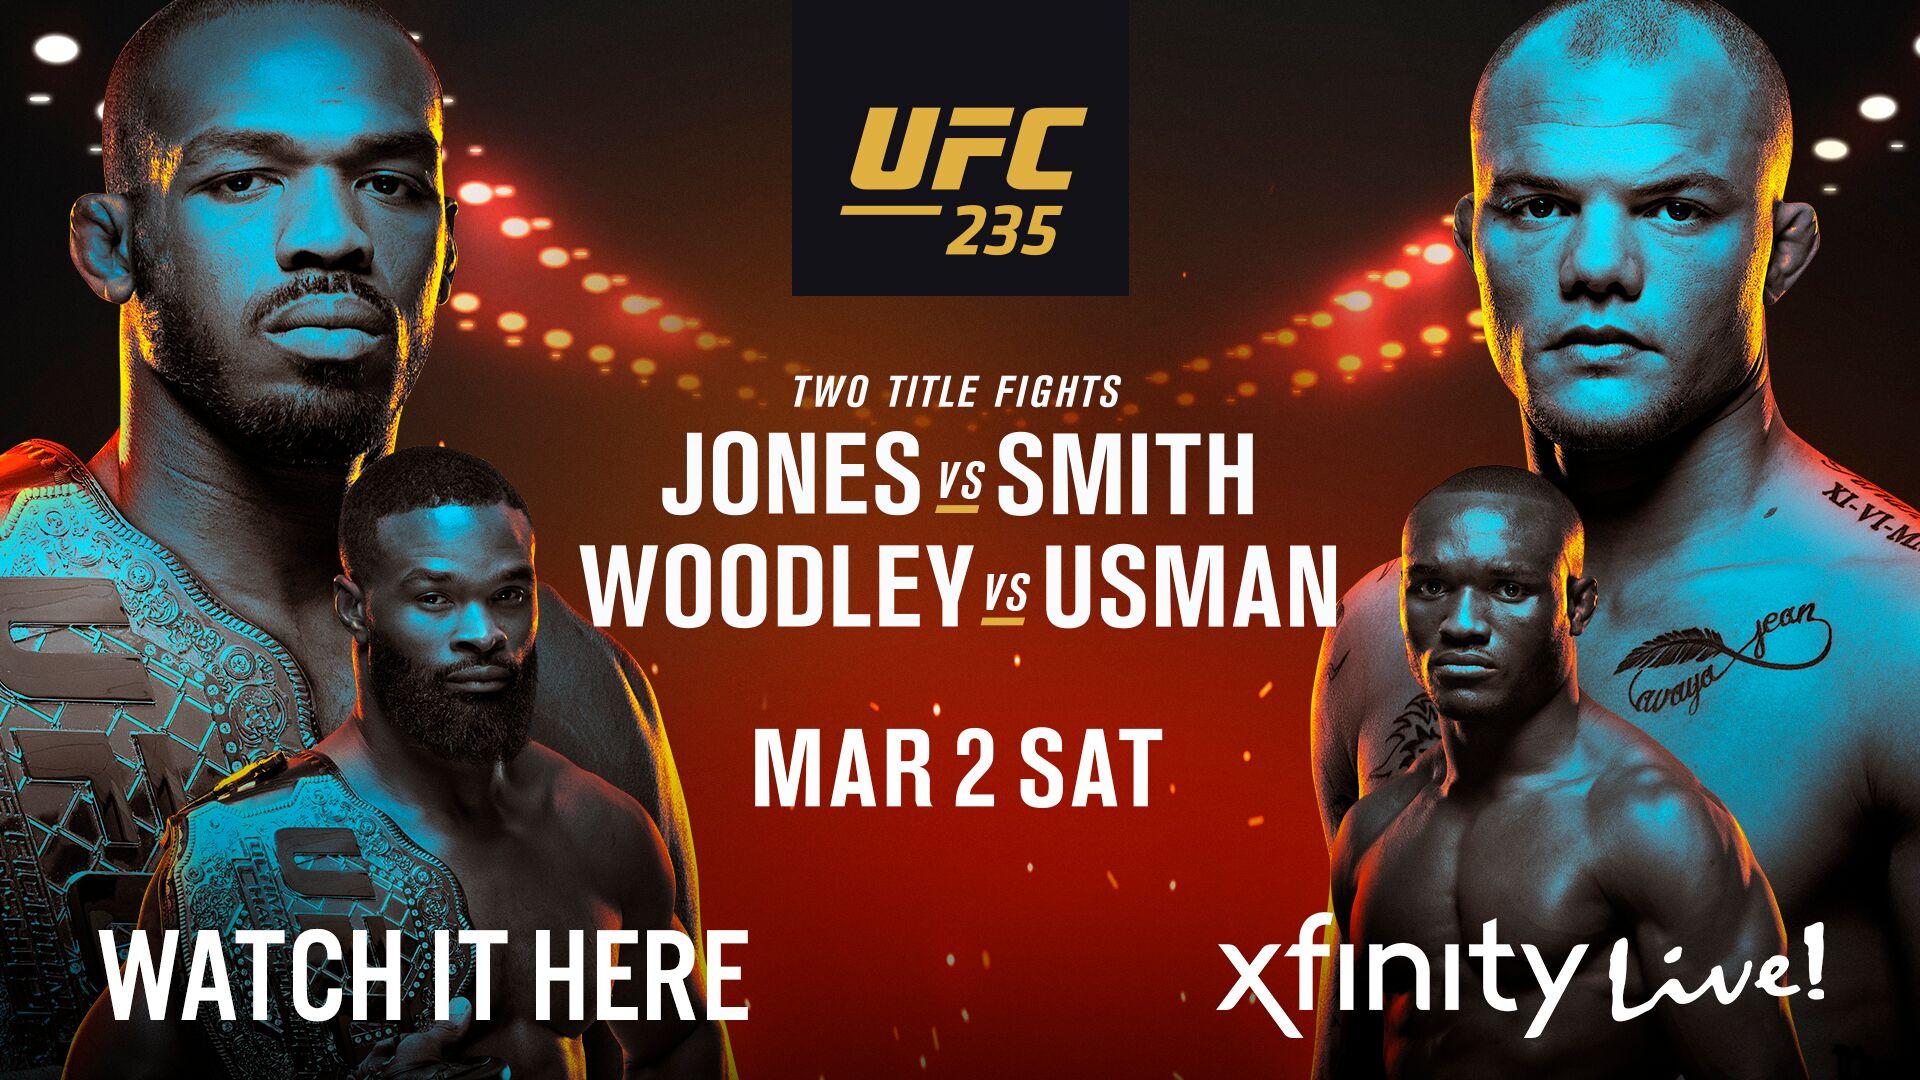 UFC 235 Jones vs Smith XFINITY Live Philadelphia Events 1920x1080